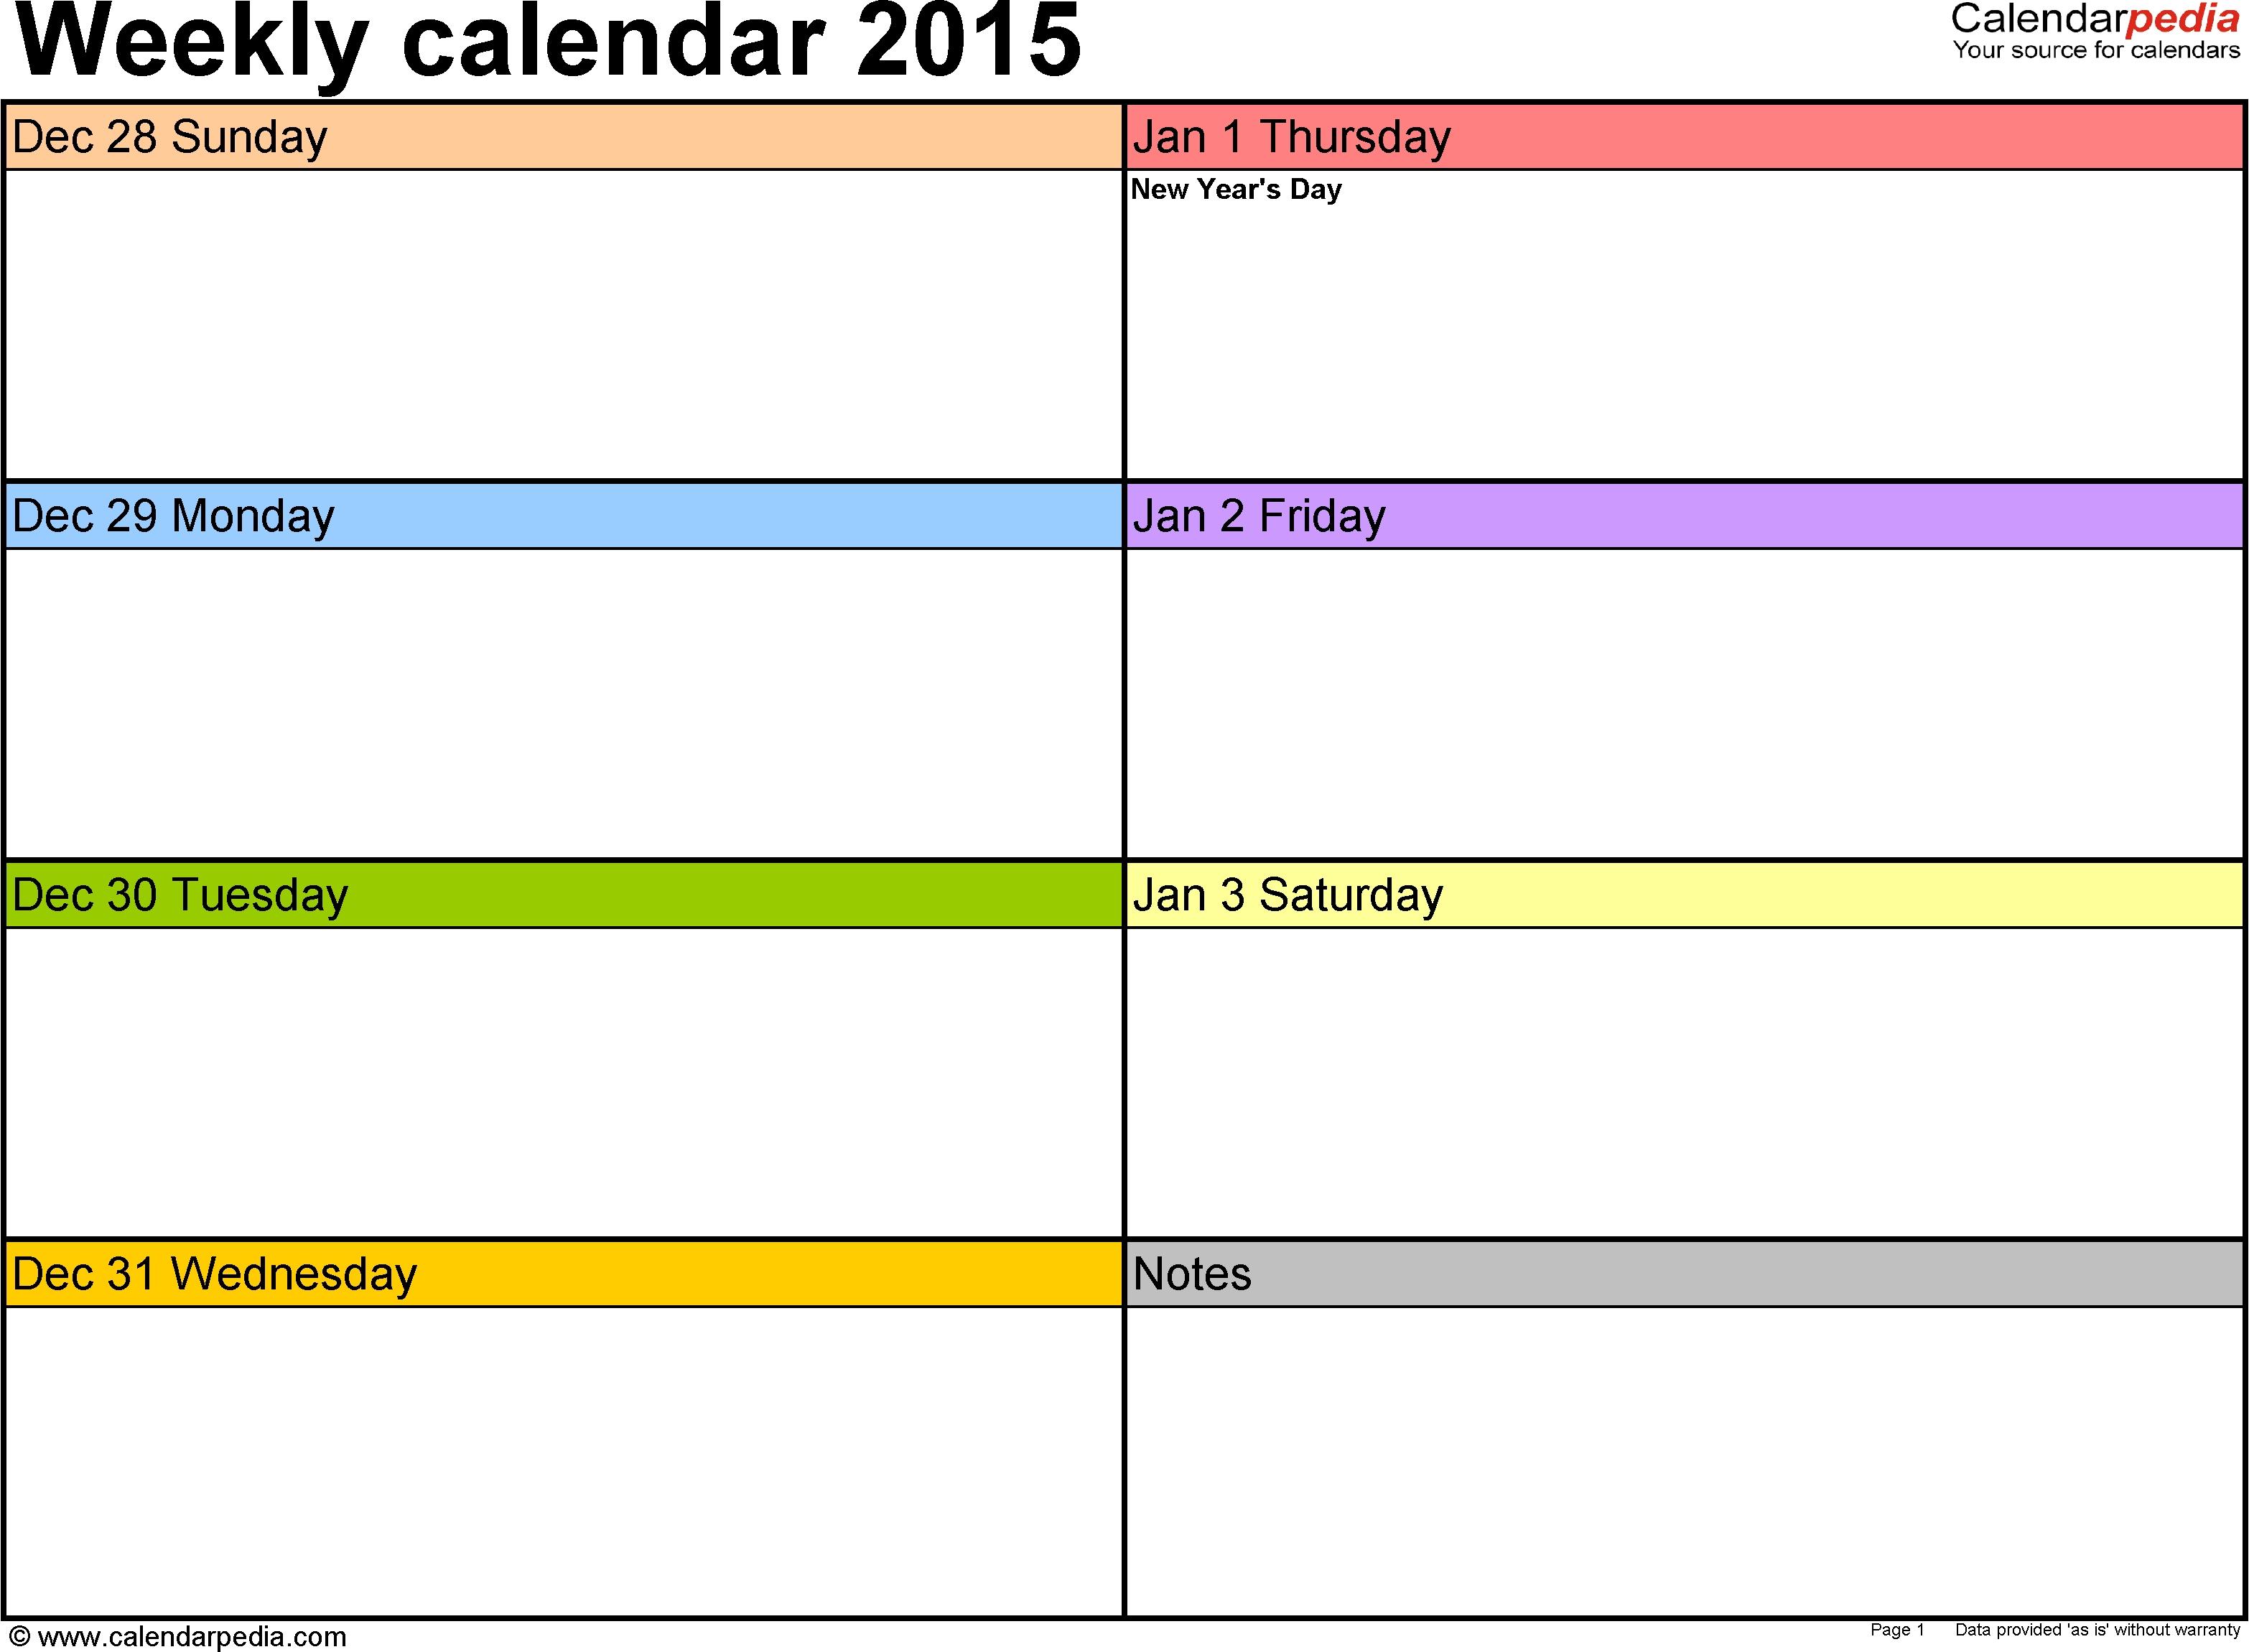 Weekly Calendar 2015 For Pdf - 12 Free Printable Templates regarding 5 Day Week Monthly Calendar Templates